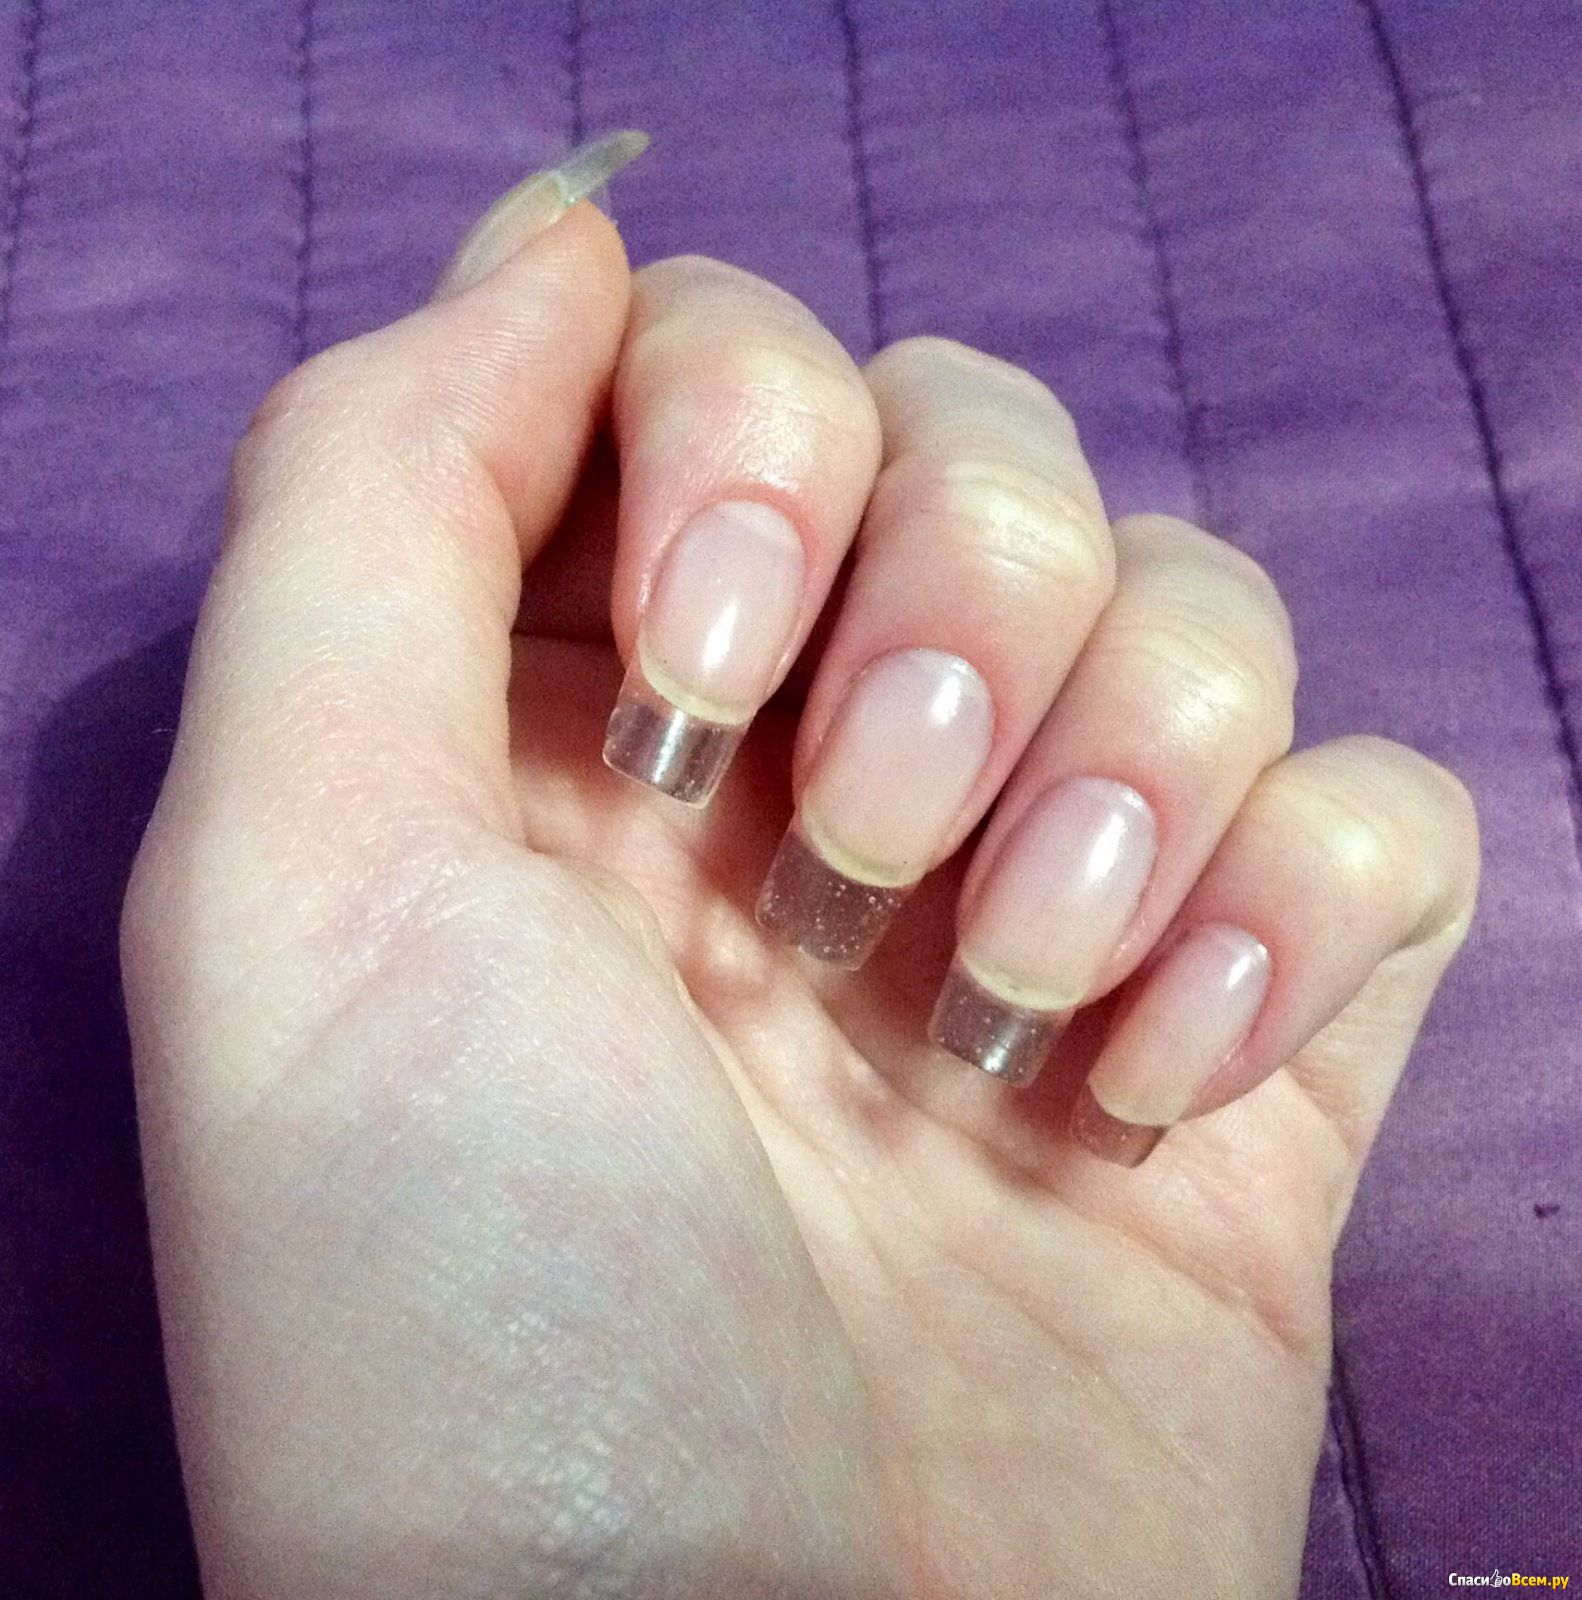 Наращивания ногтей на формы фото